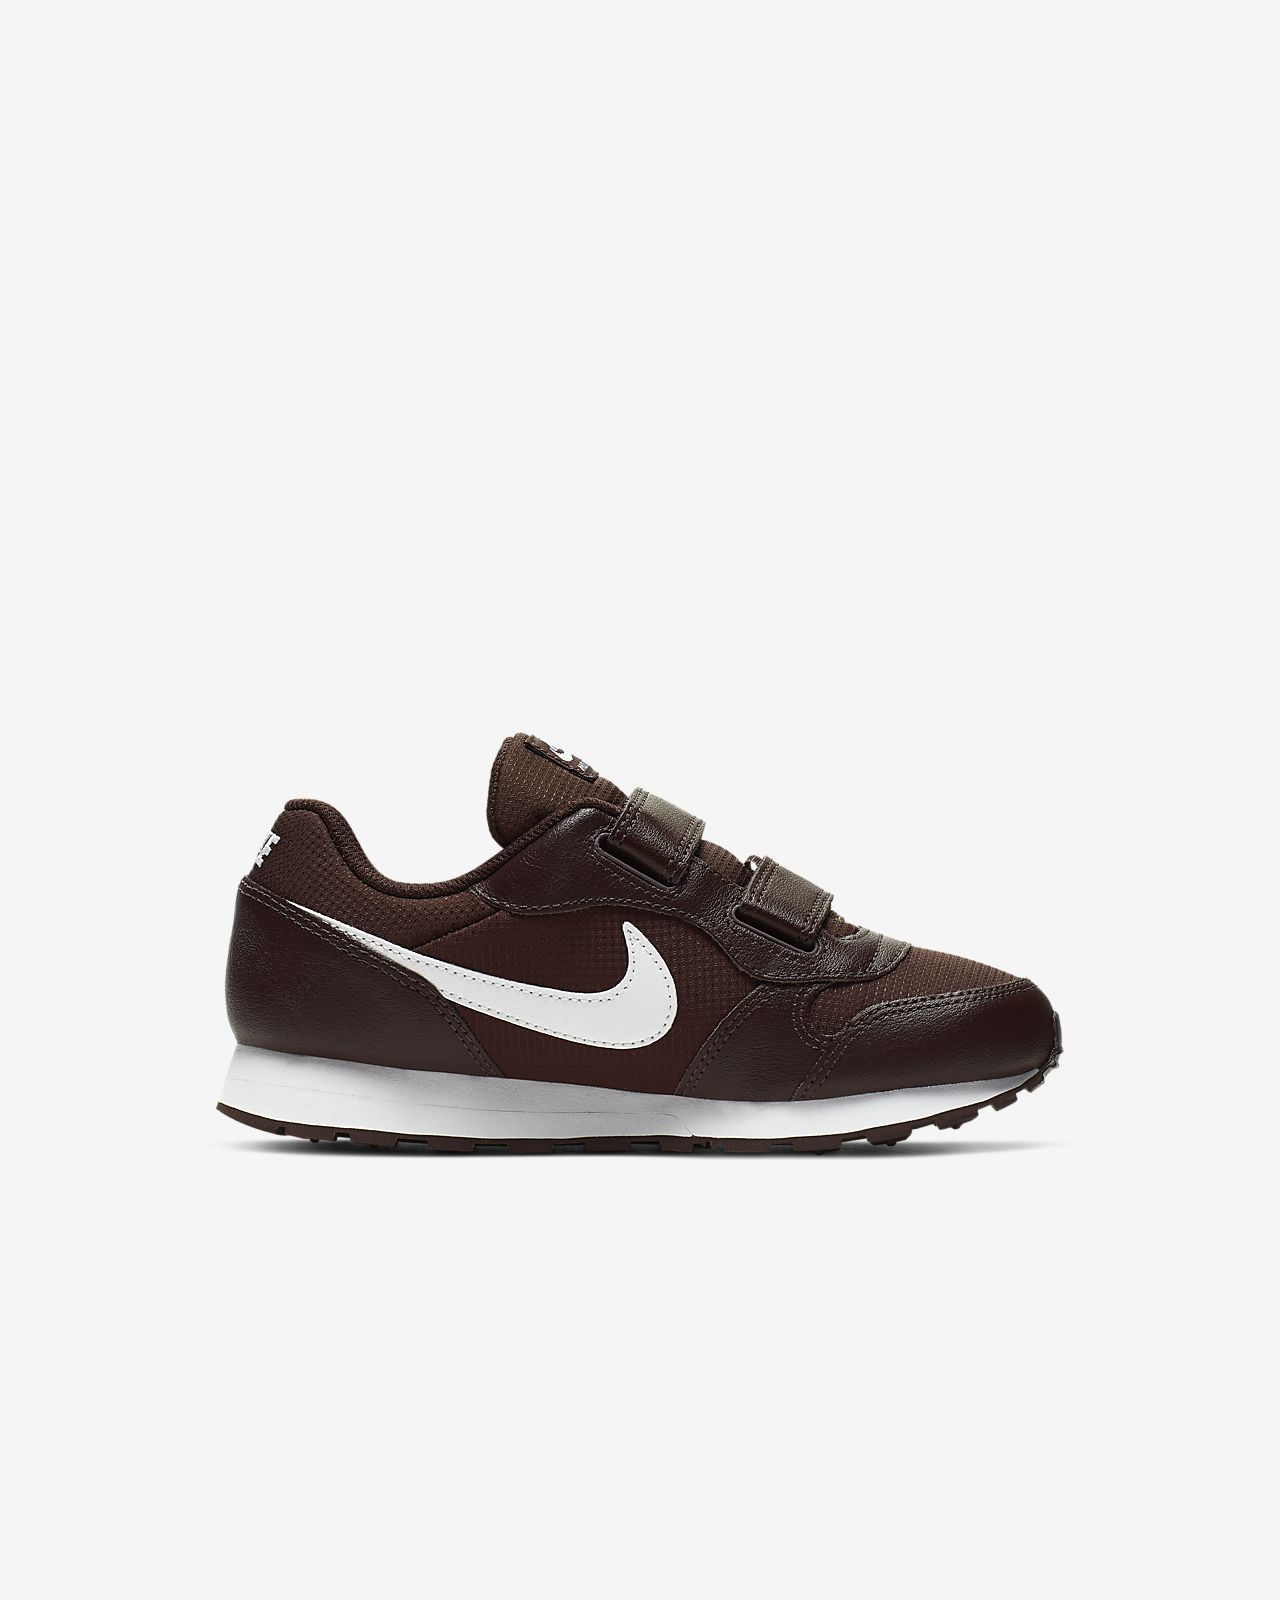 1054ce0d5115 Scarpa Nike MD Runner 2 PE - Bambini. Nike.com IT